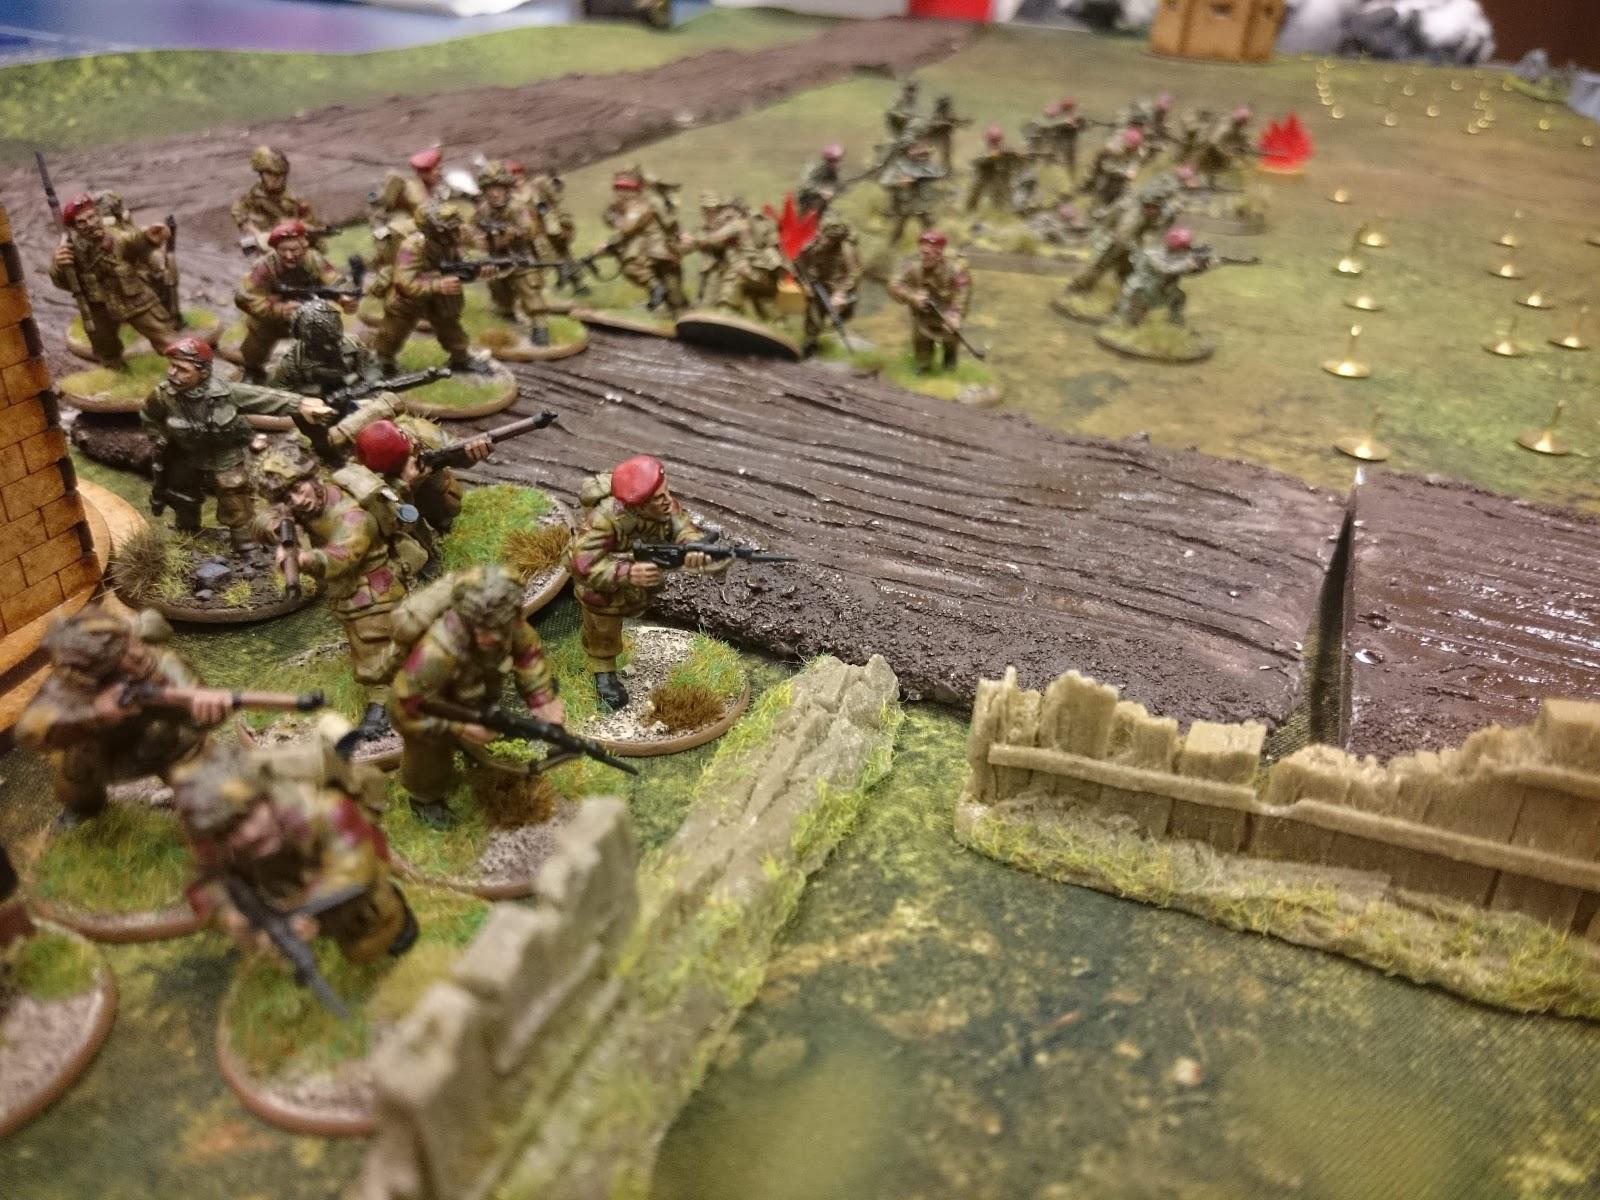 Koniggruppen versus 4KSLI; 11th Armoured Div in a fierce infantry engagement